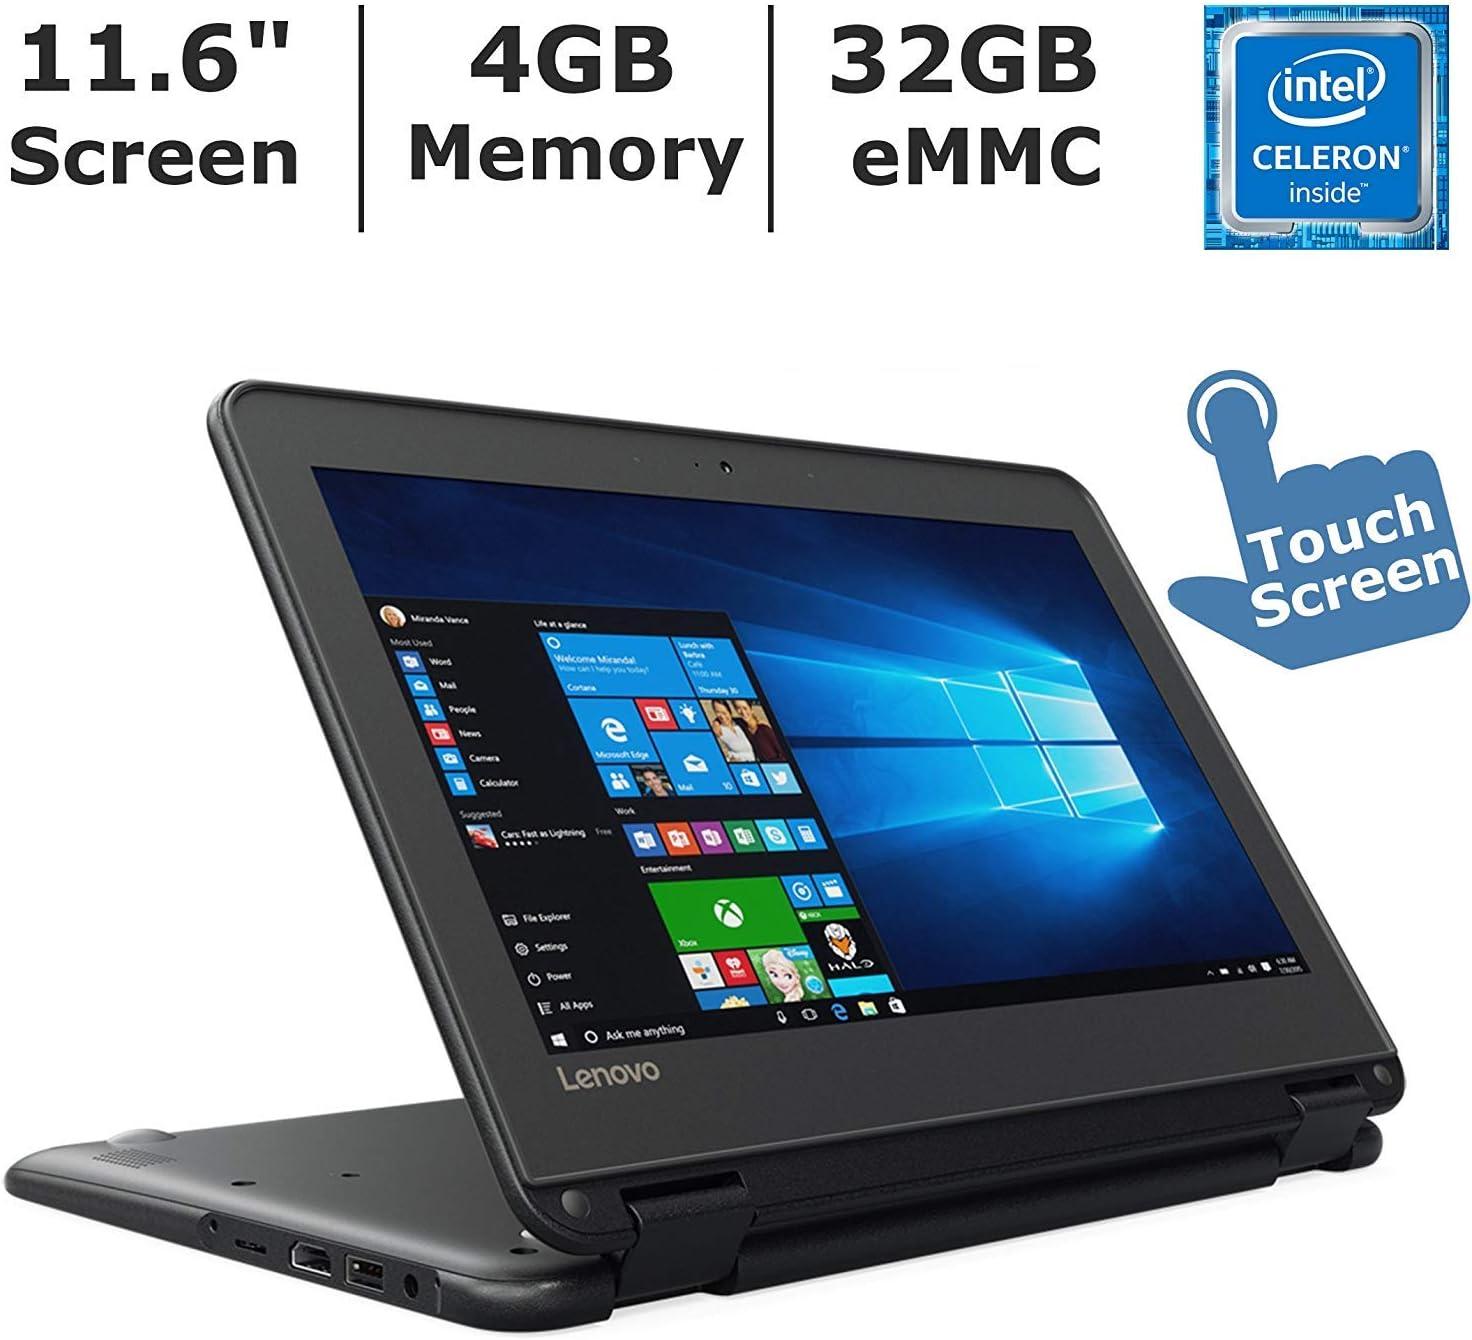 Lenovo 80UR001FUS N23 80UR - Flip Design - Celeron N3060 / 1.6 GHz - Win 10 Pro 64-bit - 4 GB RAM - 32 GB eMMC - 11.6 inch Touchscreen 1366 x 768 (HD)